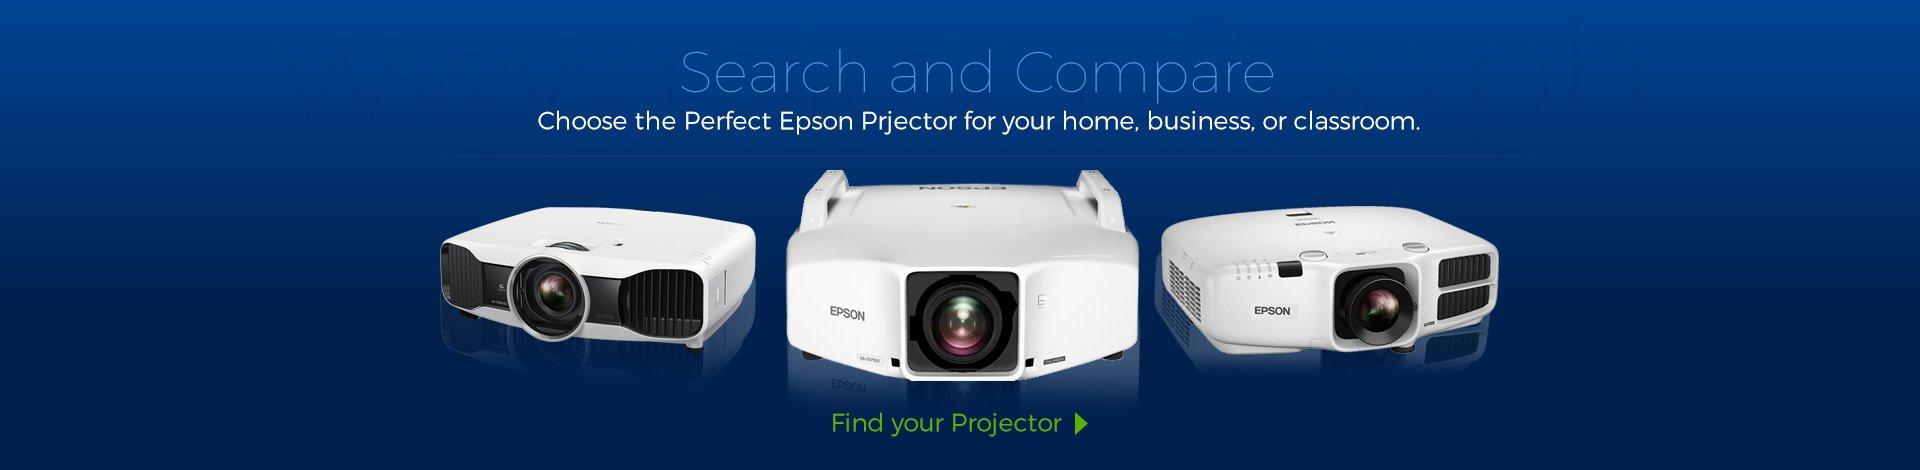 Business Projectors